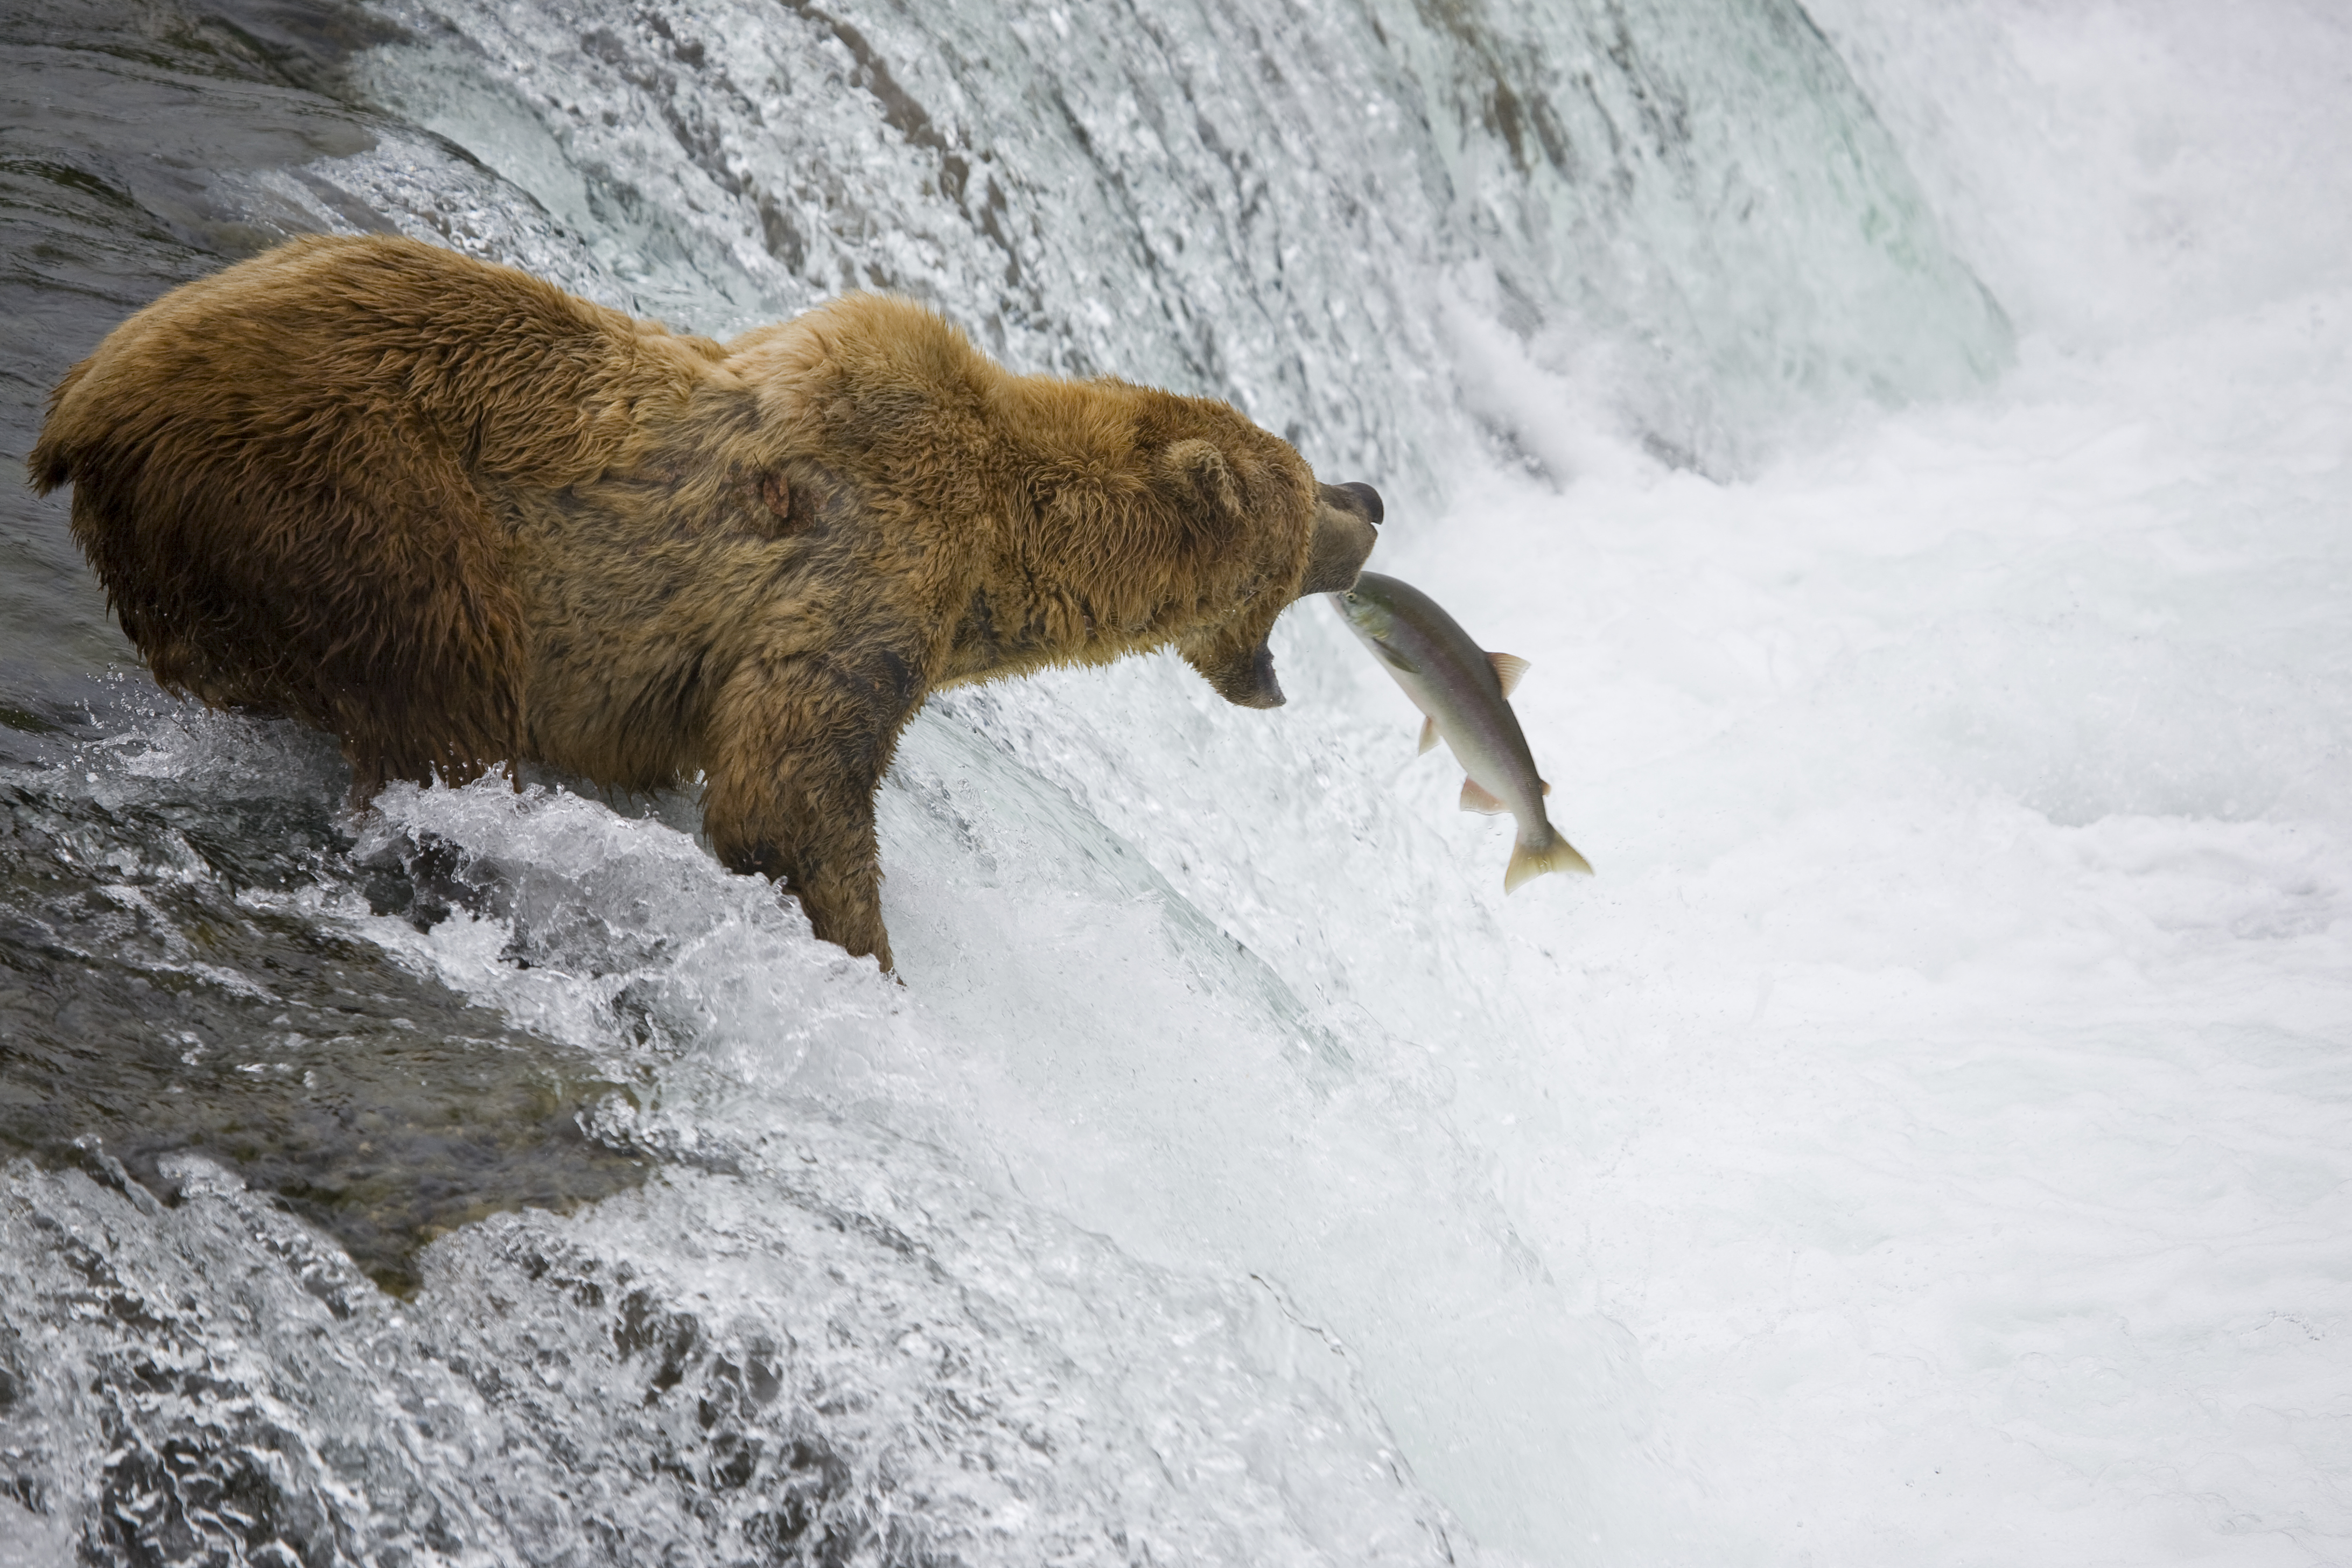 Bear catching salmon, Alaska